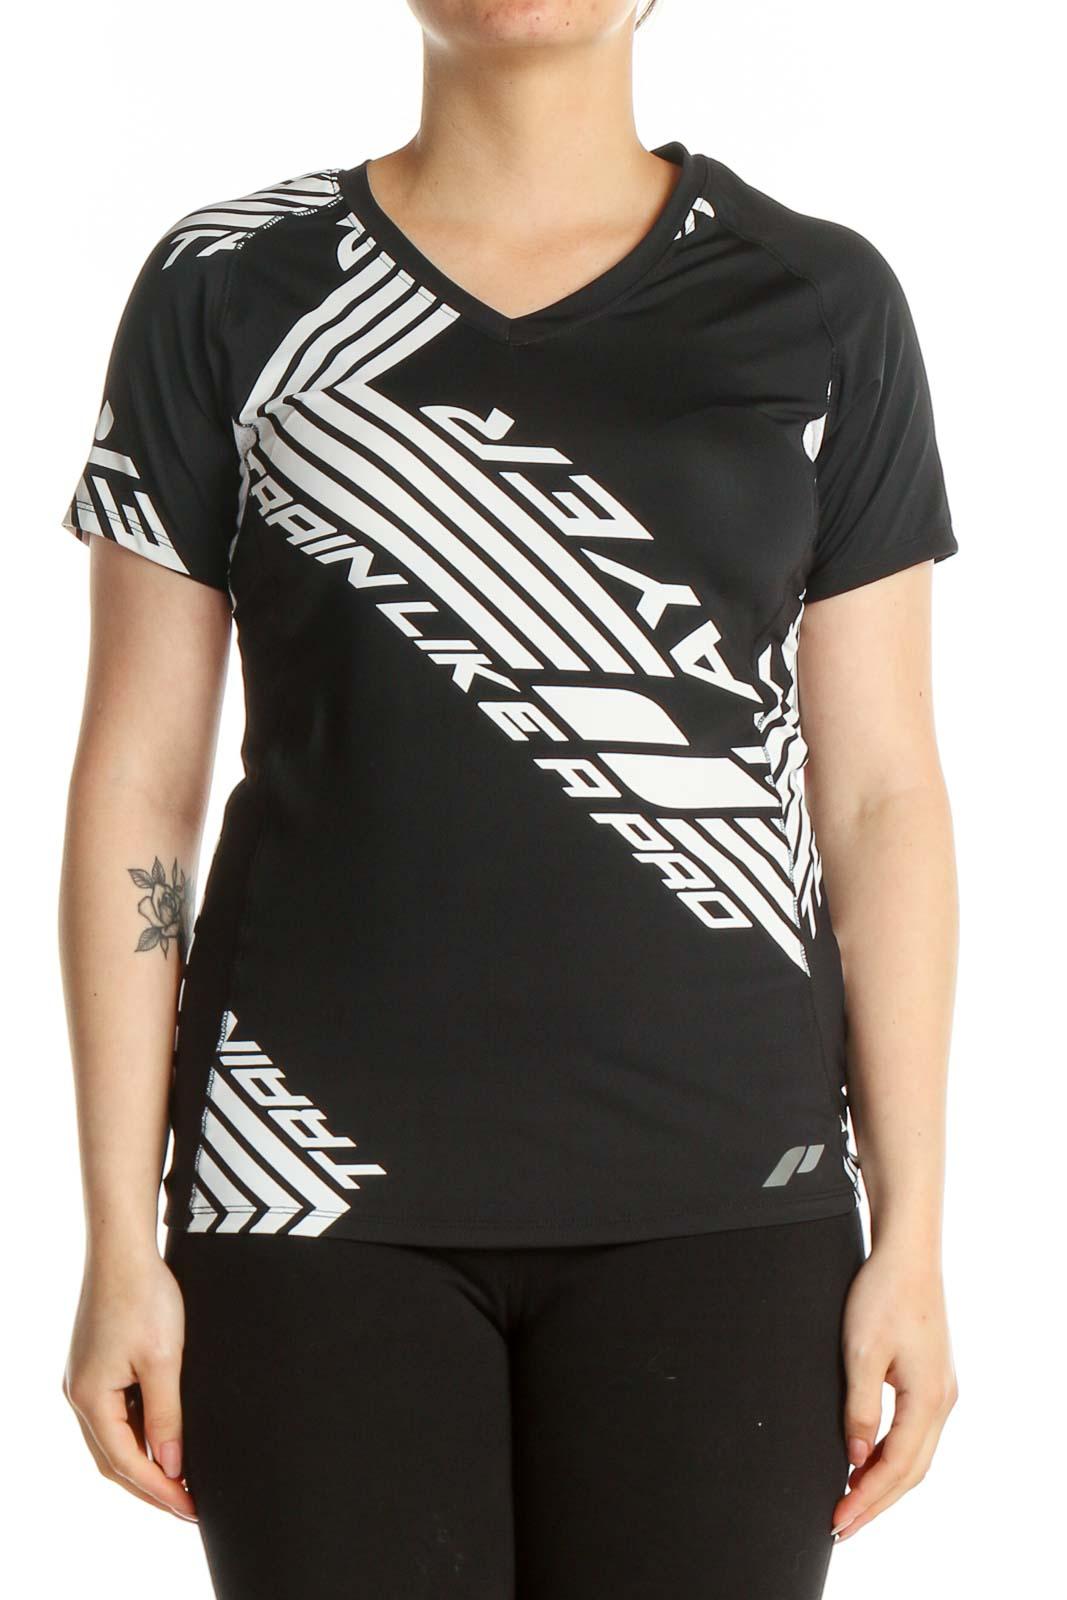 Black Graphic Print Activewear T-Shirt Front